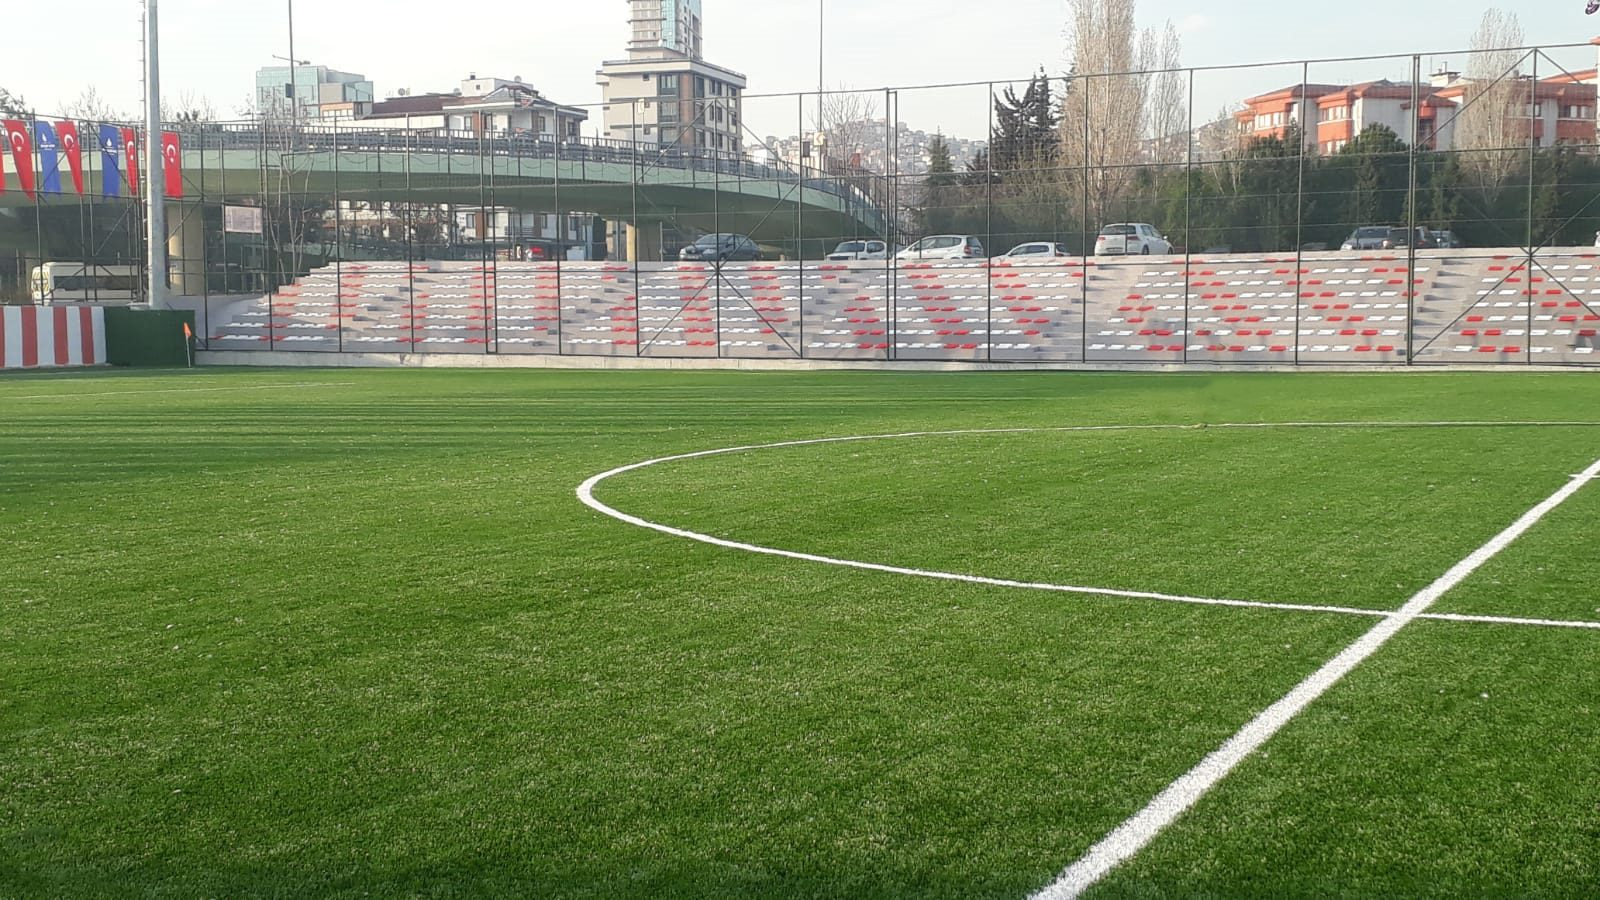 Kartal Stadyumu / İstanbul